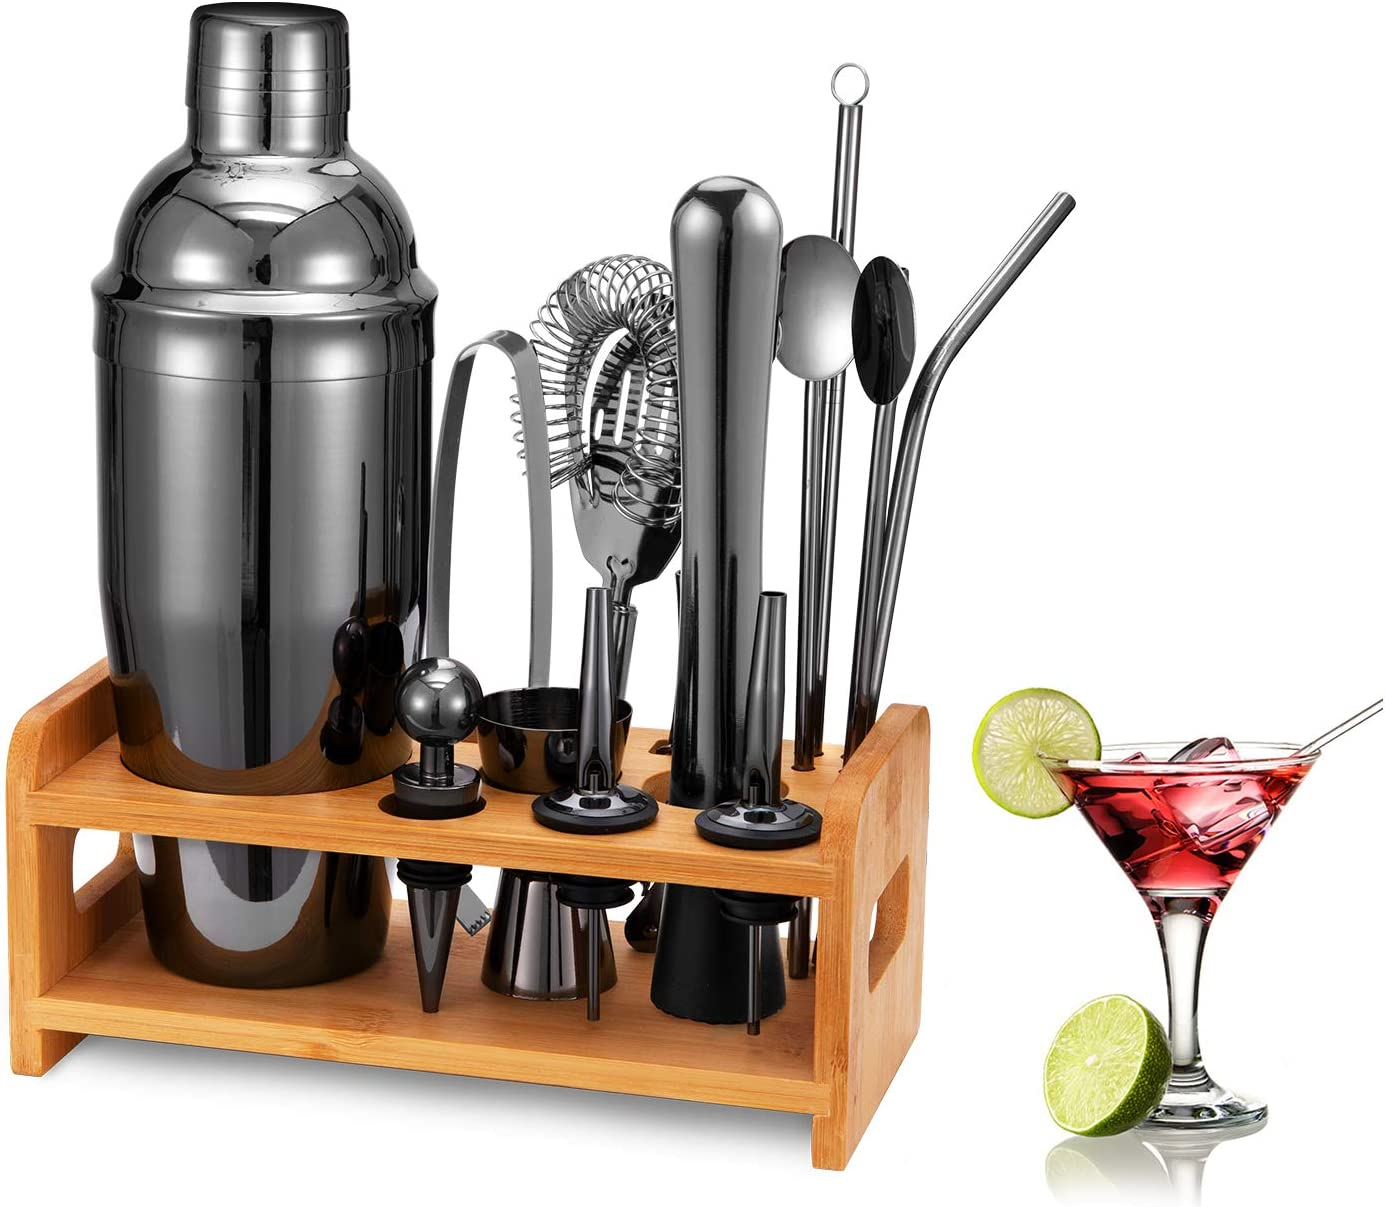 HB life 15 Pezzi Cocktail Shaker Set in 304 Acciaio Inossidabile Completo